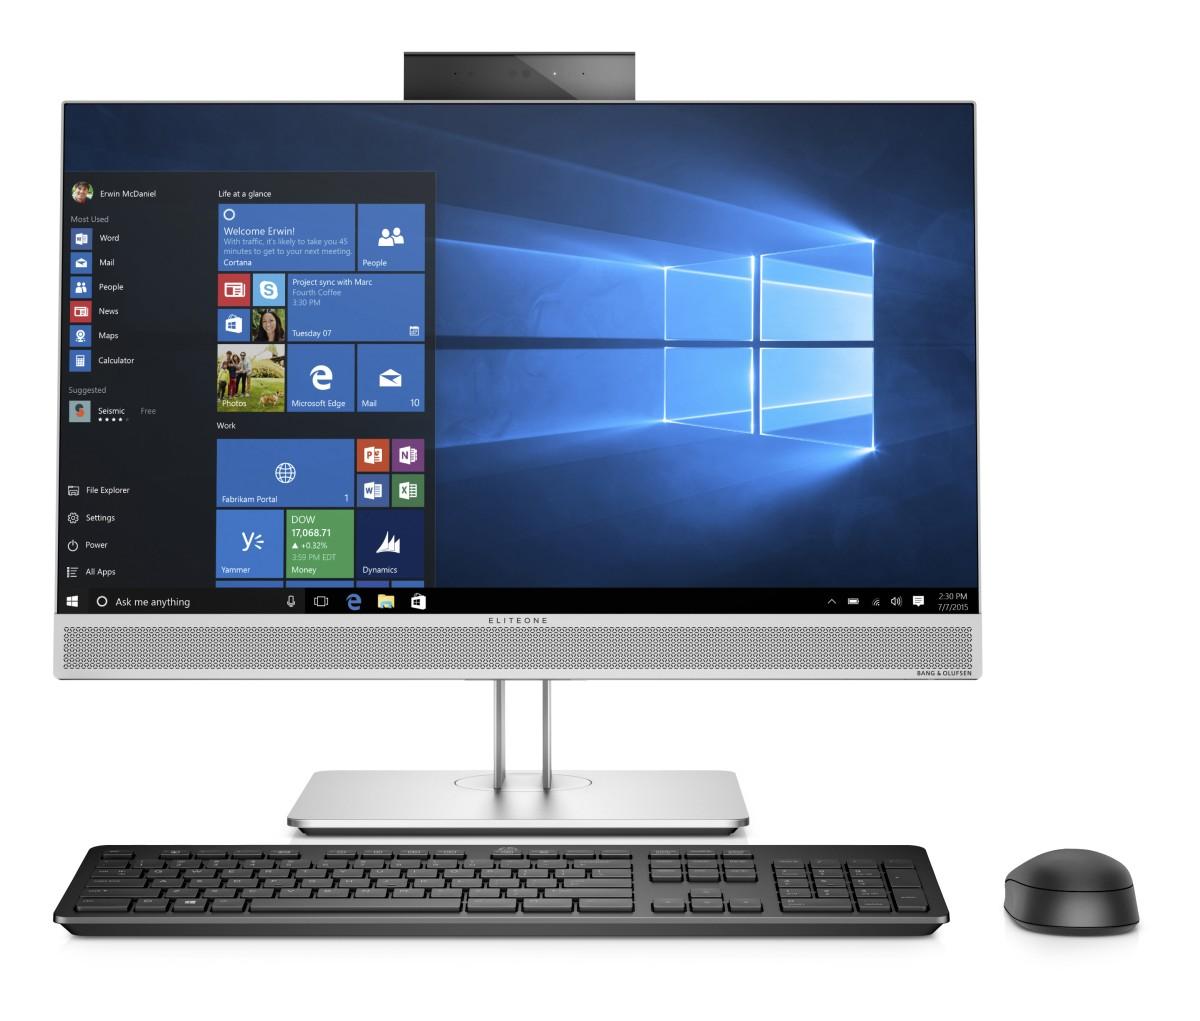 HP EliteOne 800G4 AiO 23.8T i7-8700,8GB,256GB M.2,WiFia/b/g/n/ac+BT VPro,wrls kláv. myš,SD MCR,DVDRW, DP+HDMI, Win10Pro